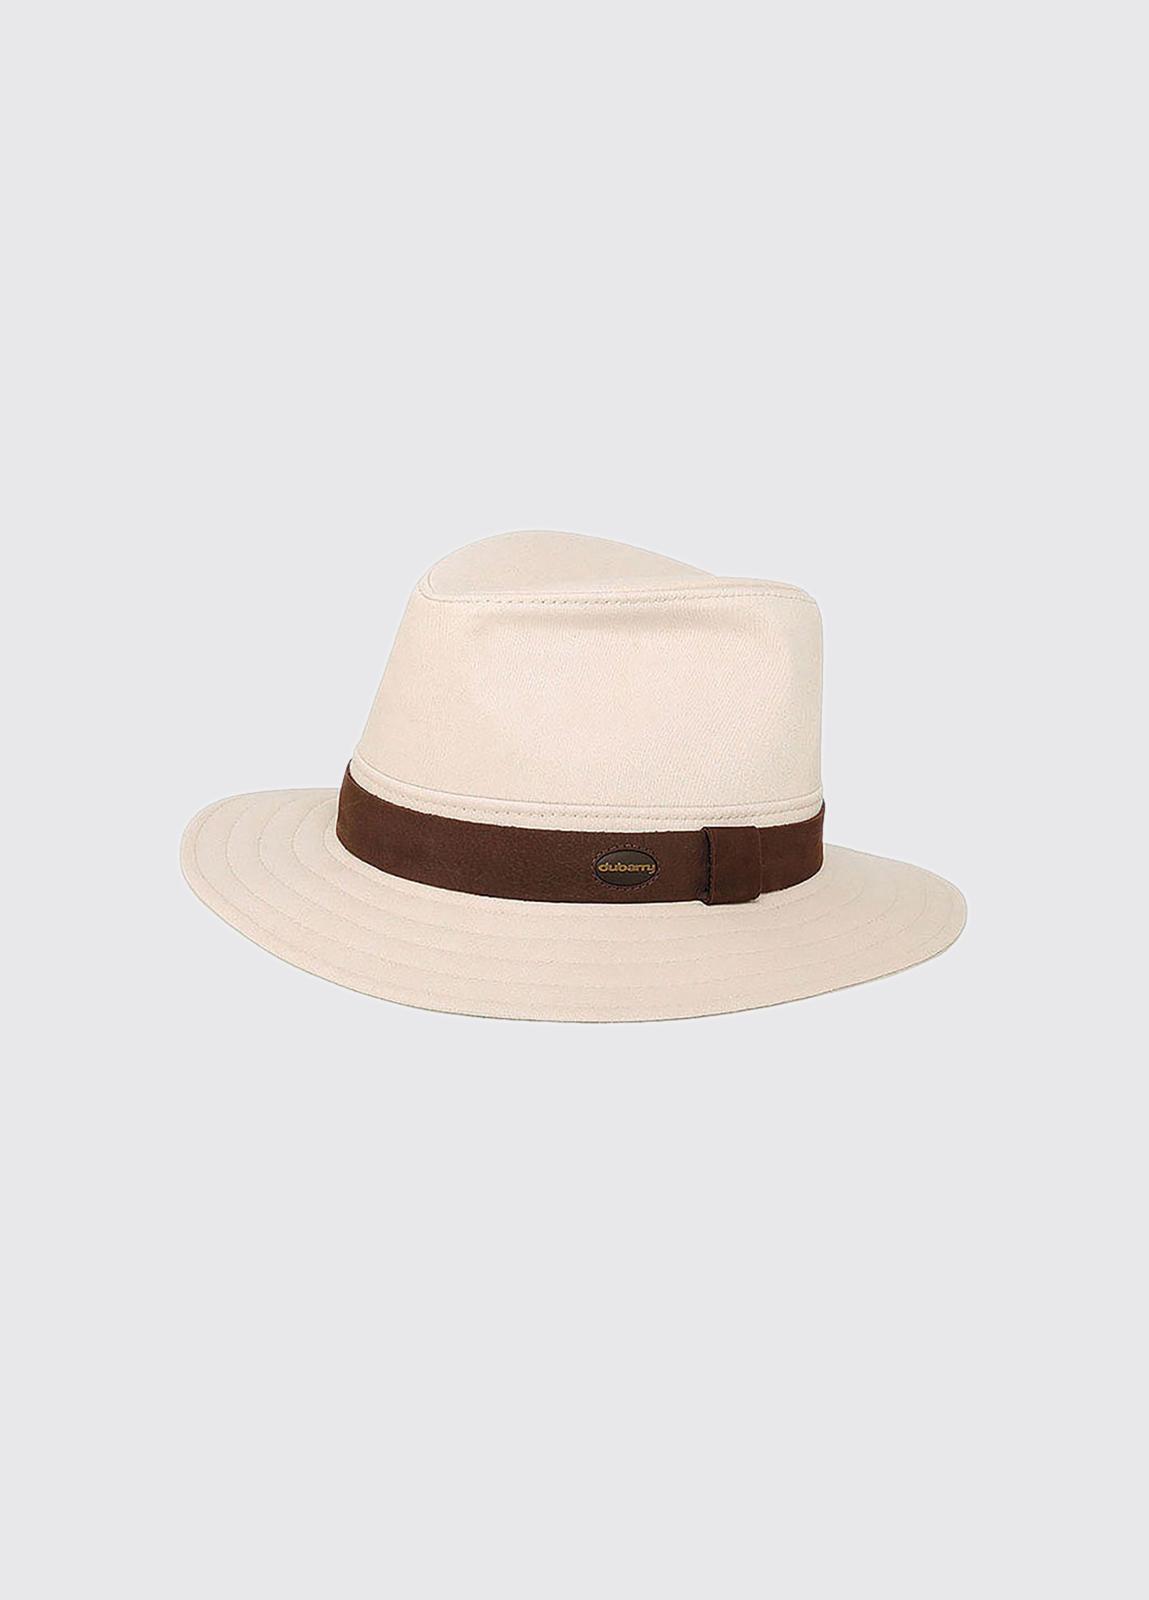 Robert Fedora style hat - Stone